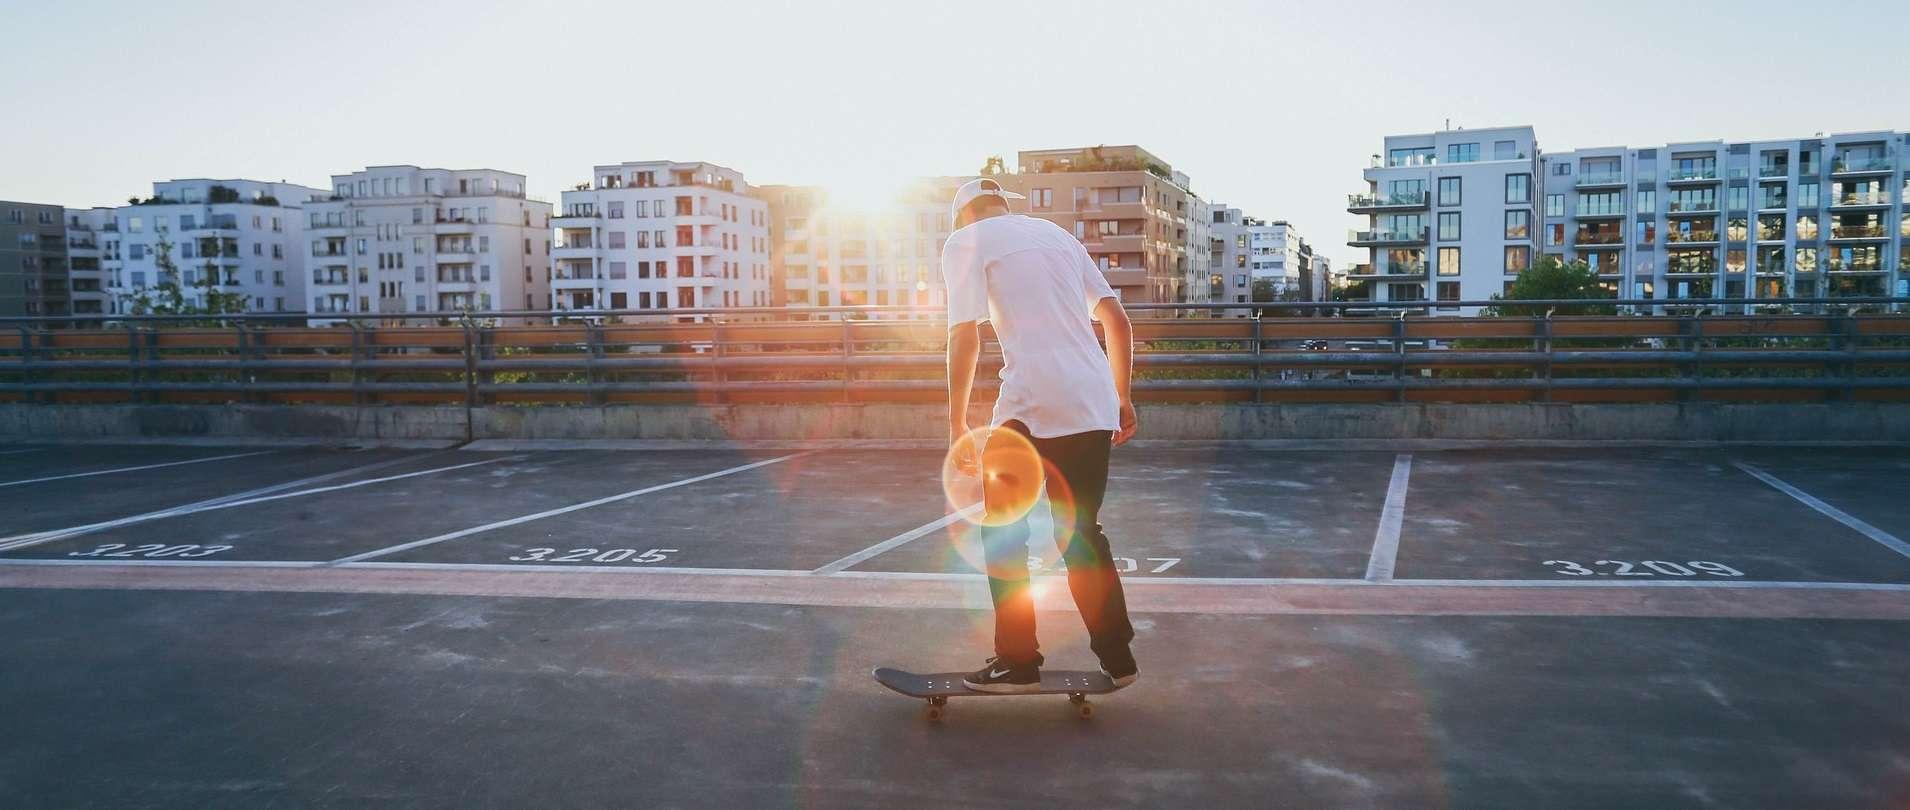 Realisation rigade Web - Skaters Underground